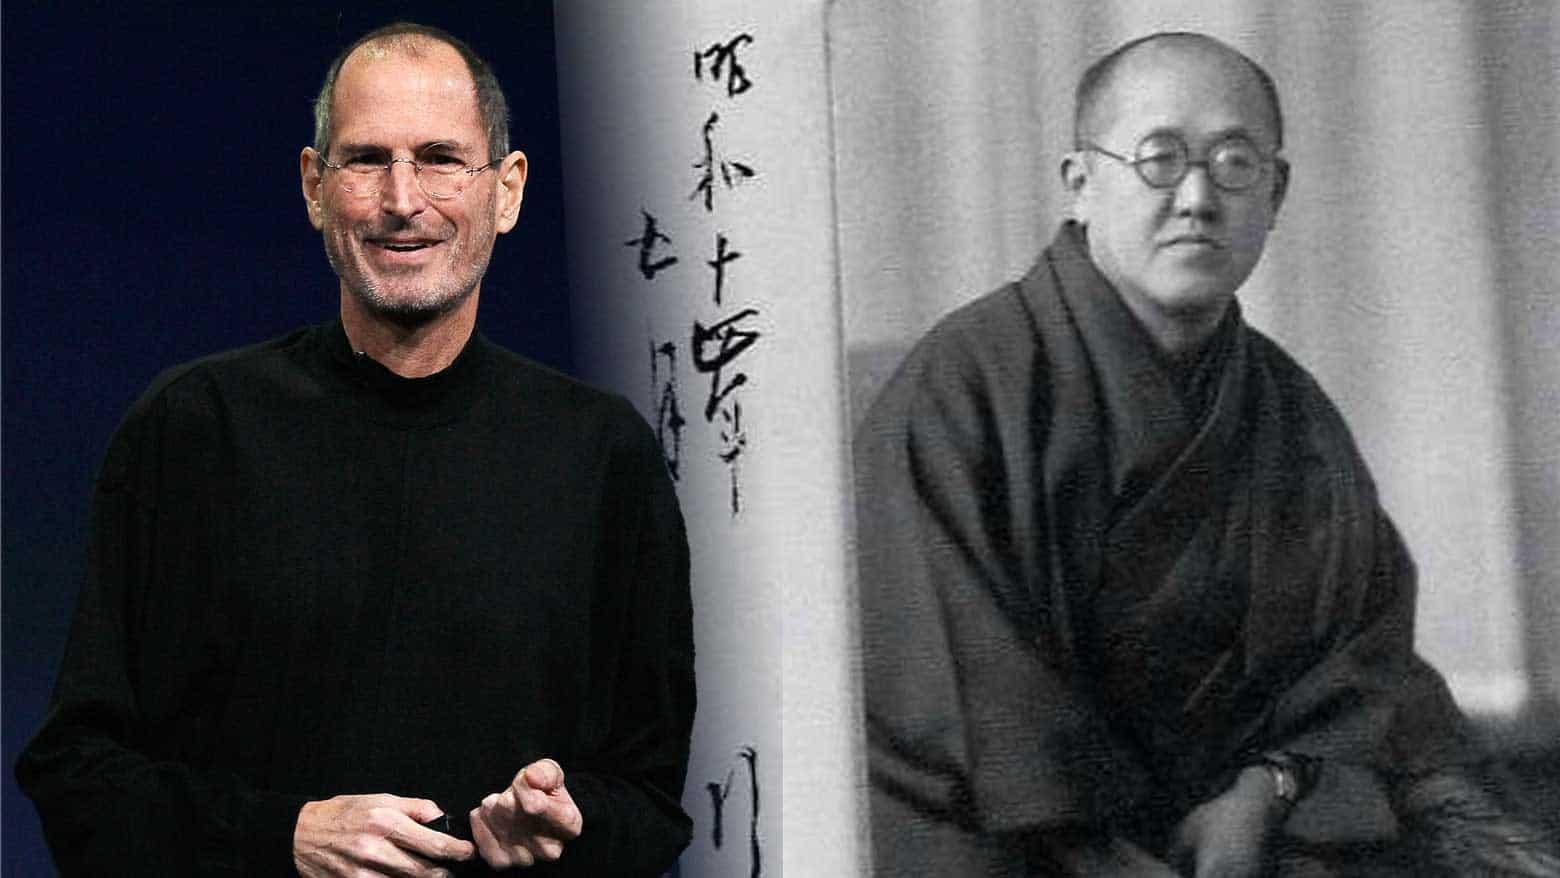 Steve Jobs und Kawase Hasui